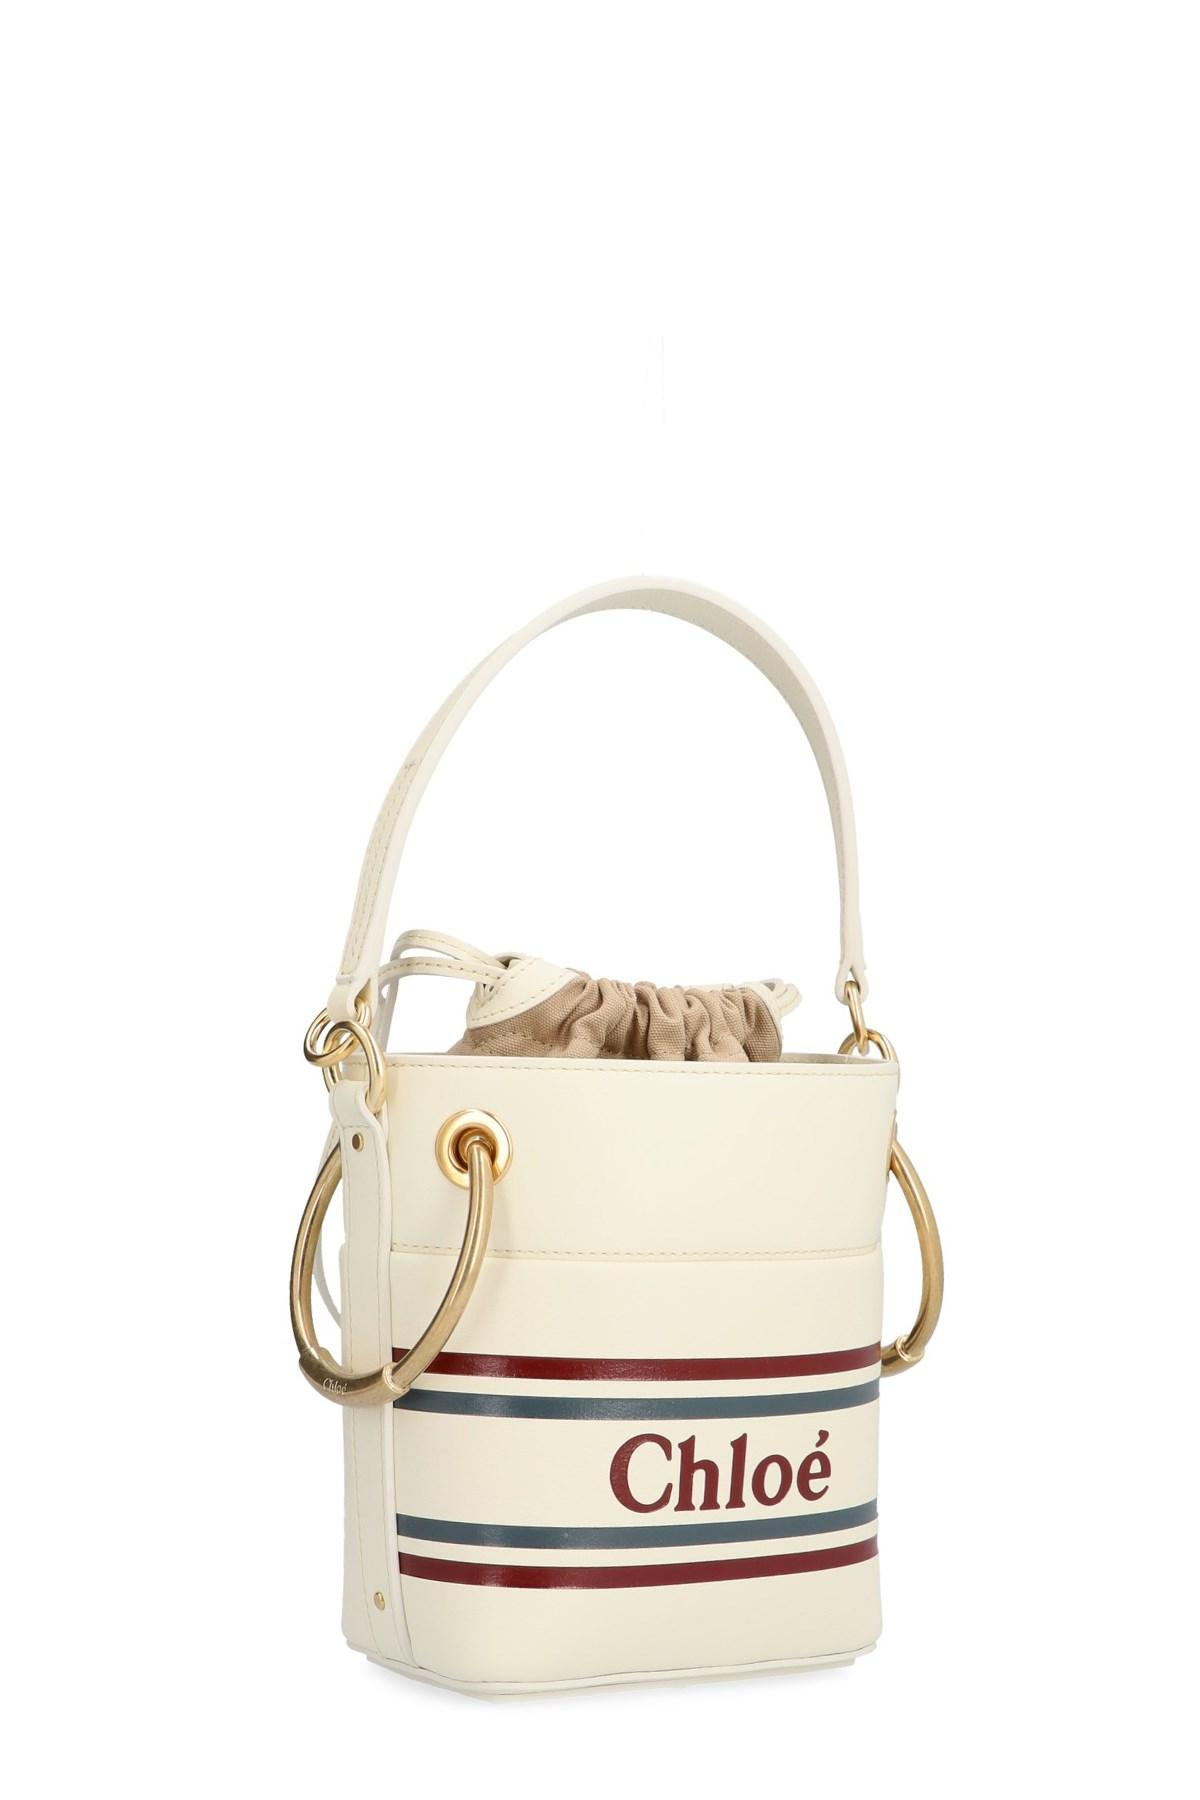 Chloé - White  roy  Bucket Bag - Lyst. View fullscreen 667f672e276ea